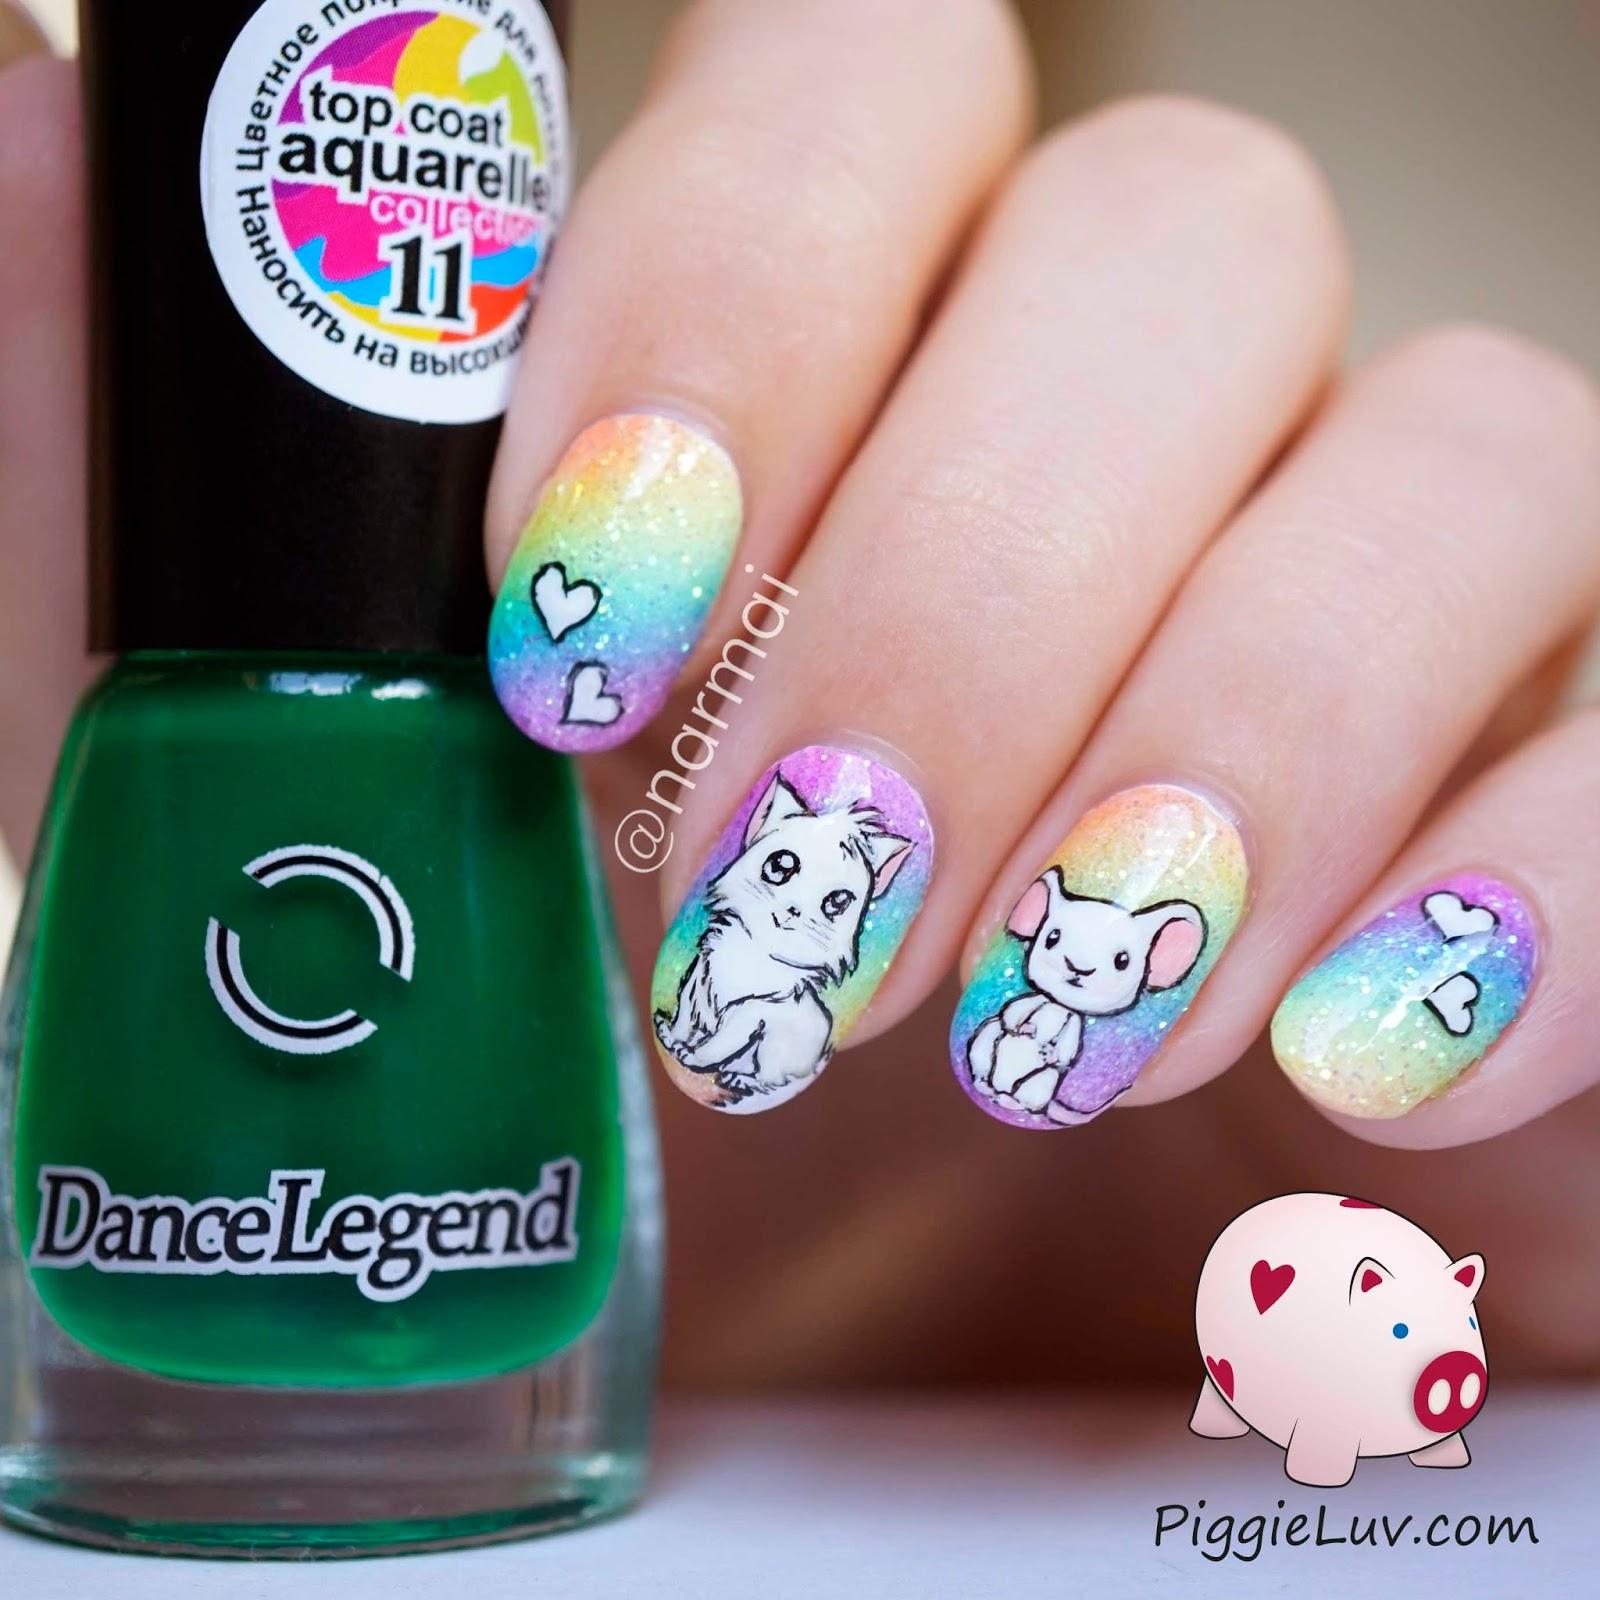 Piggieluv Rainbow Bubbles Nail Art: PiggieLuv: Cat-astrophic Glitter Rainbow Nail Art